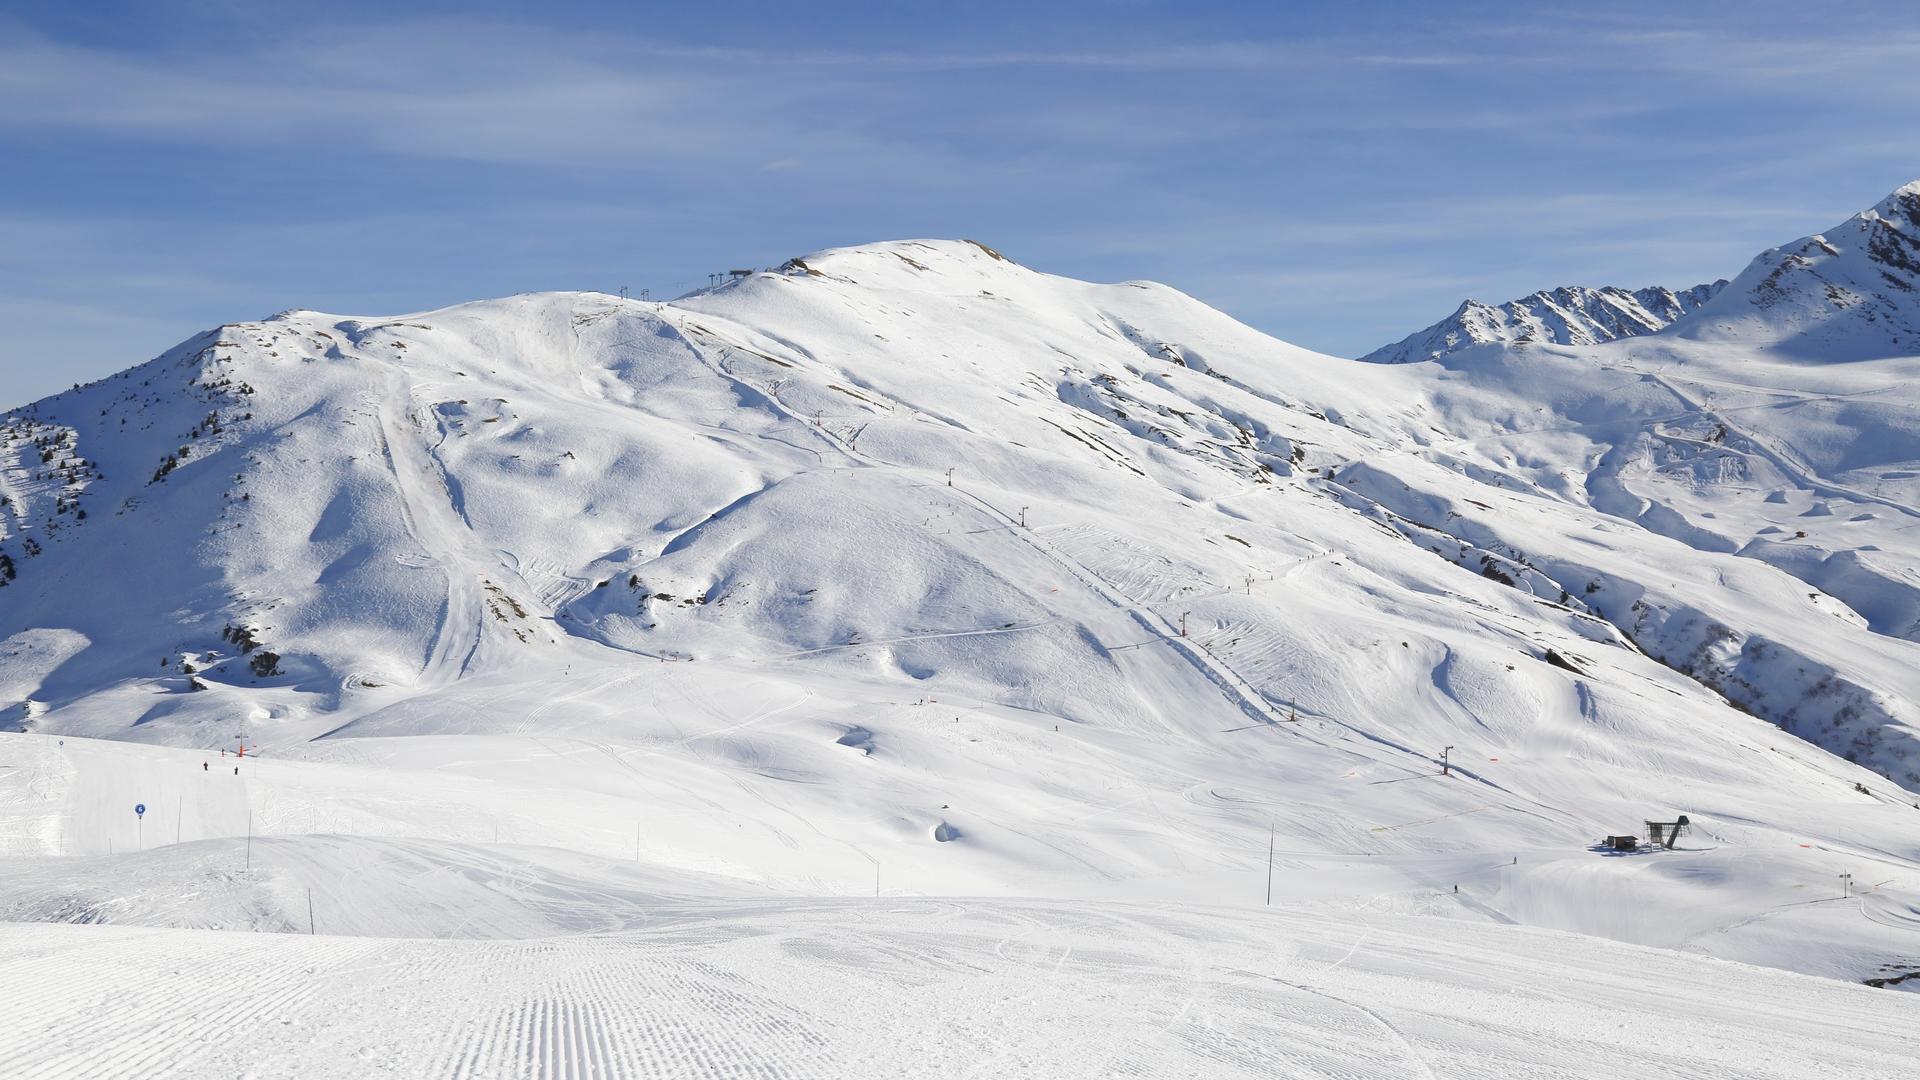 Vallorcine-Domaine skiable